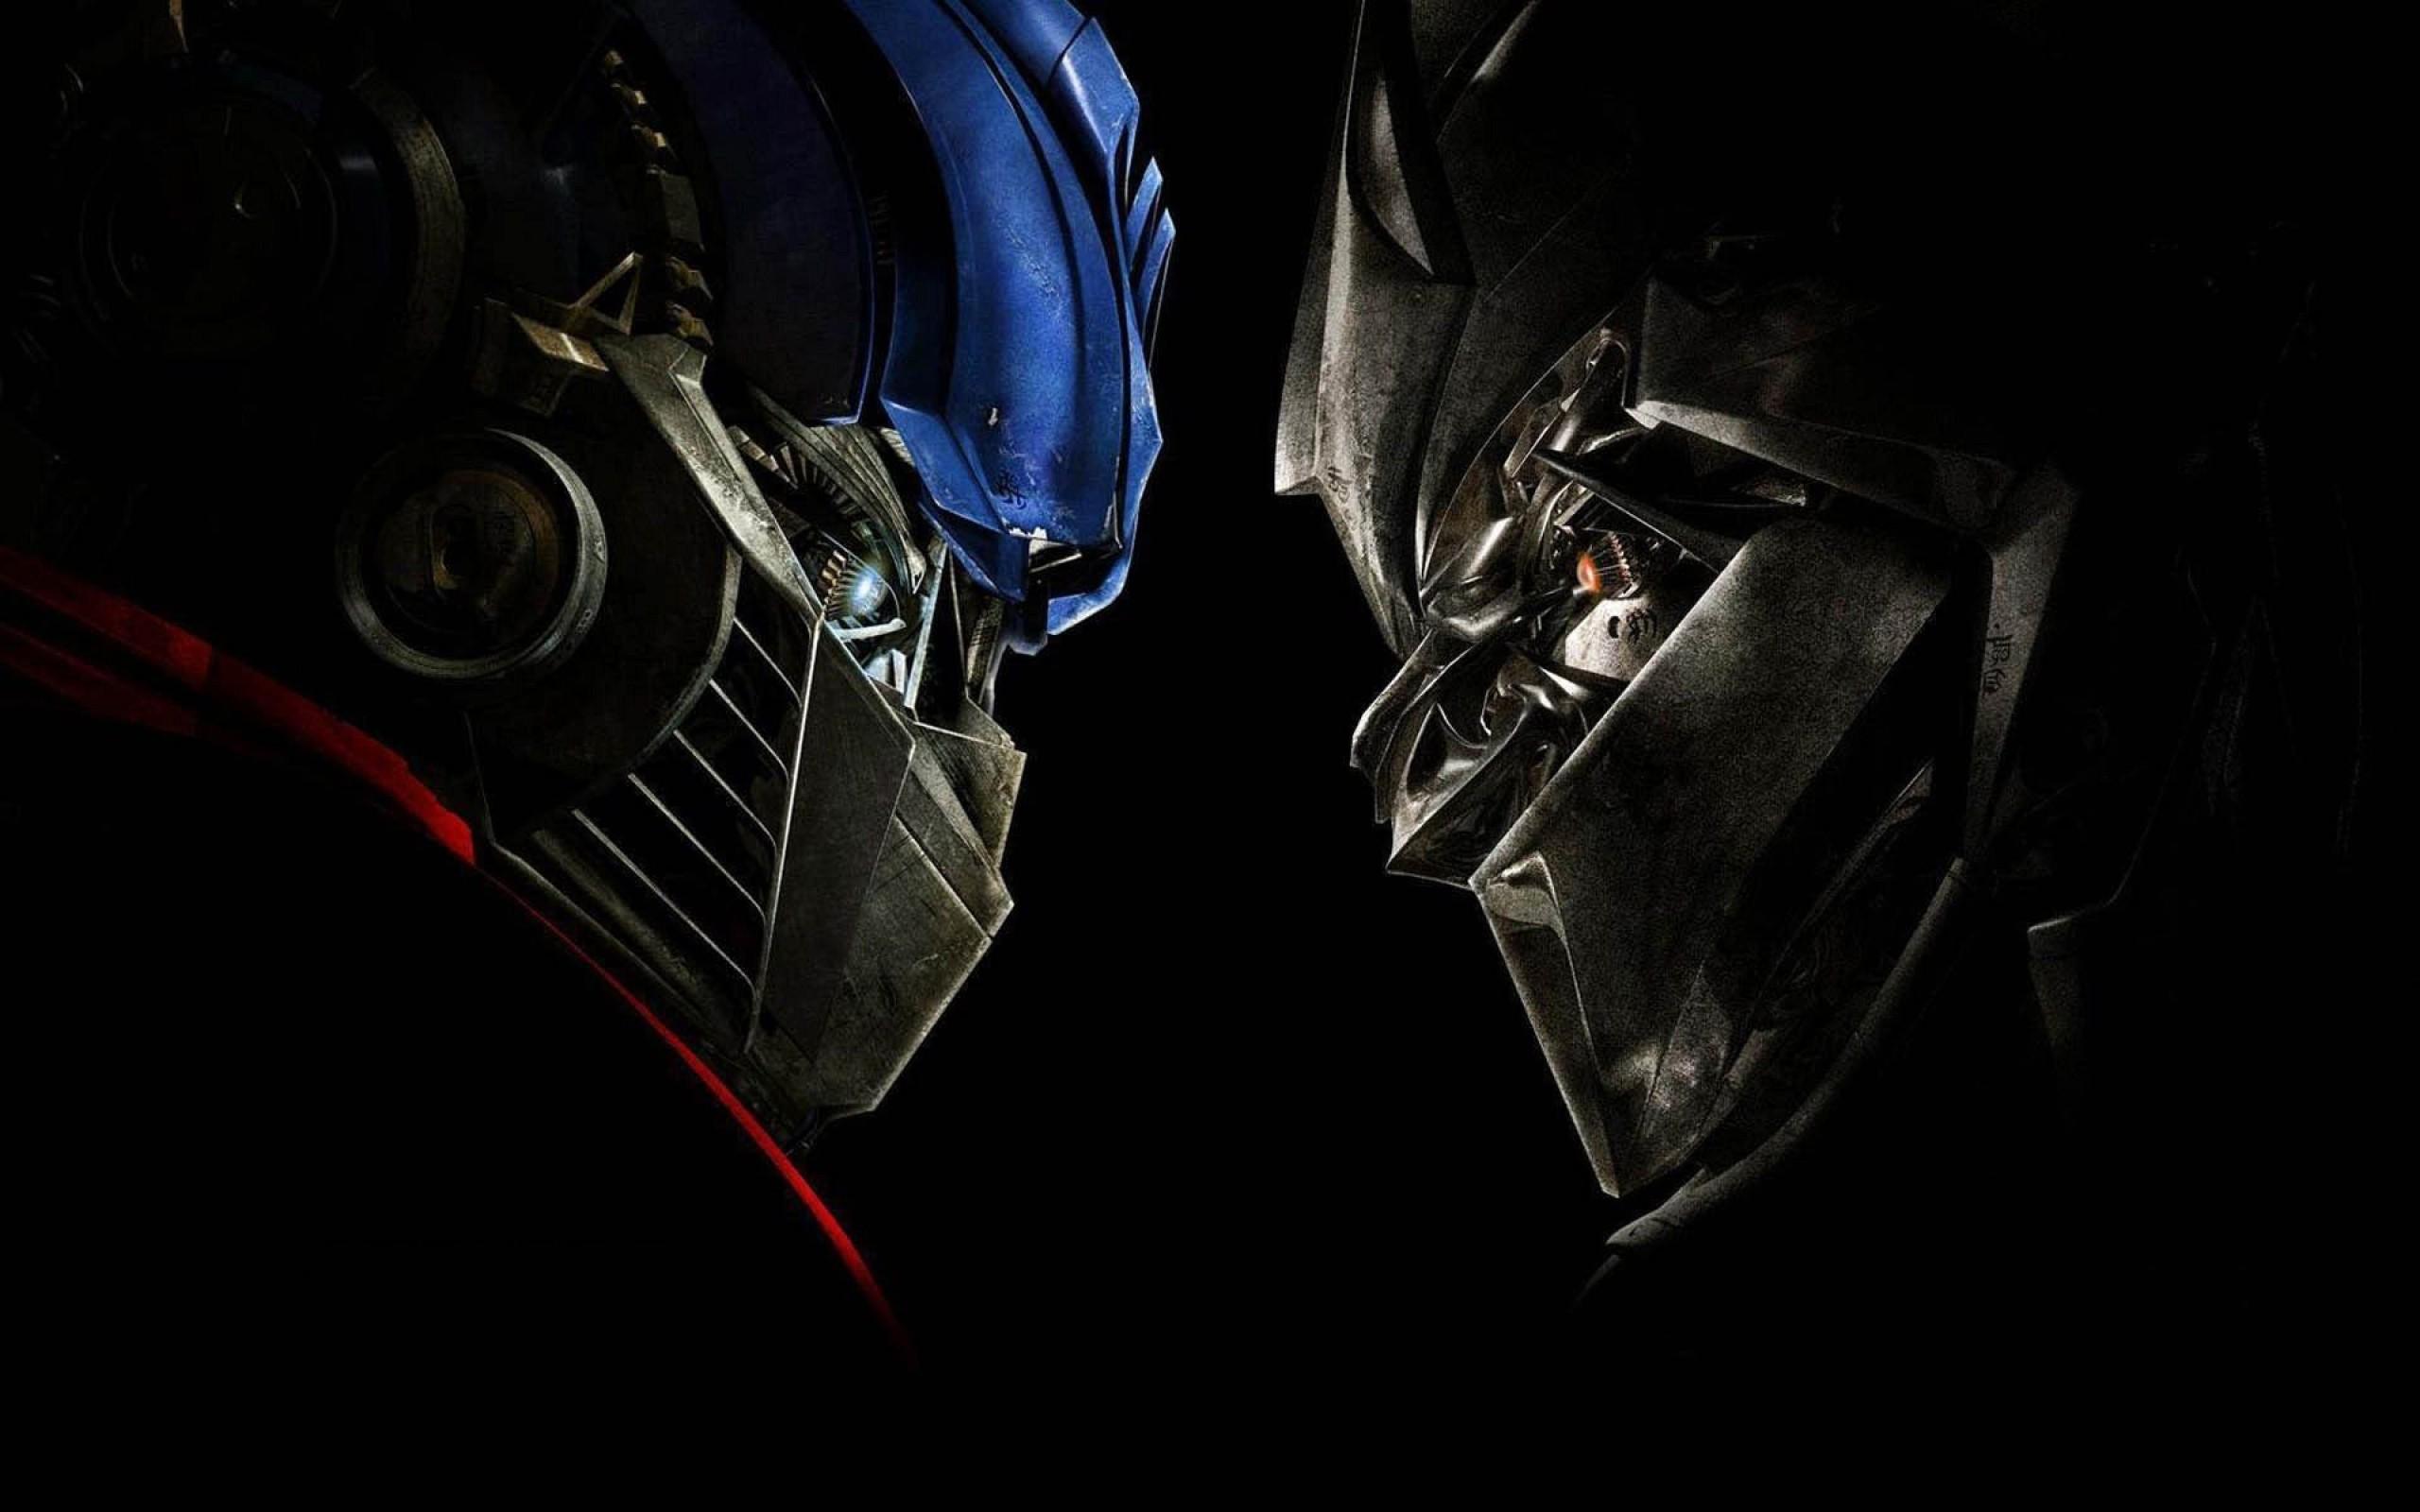 Views: 604 Fantastic Transformers Wallpaper 23655